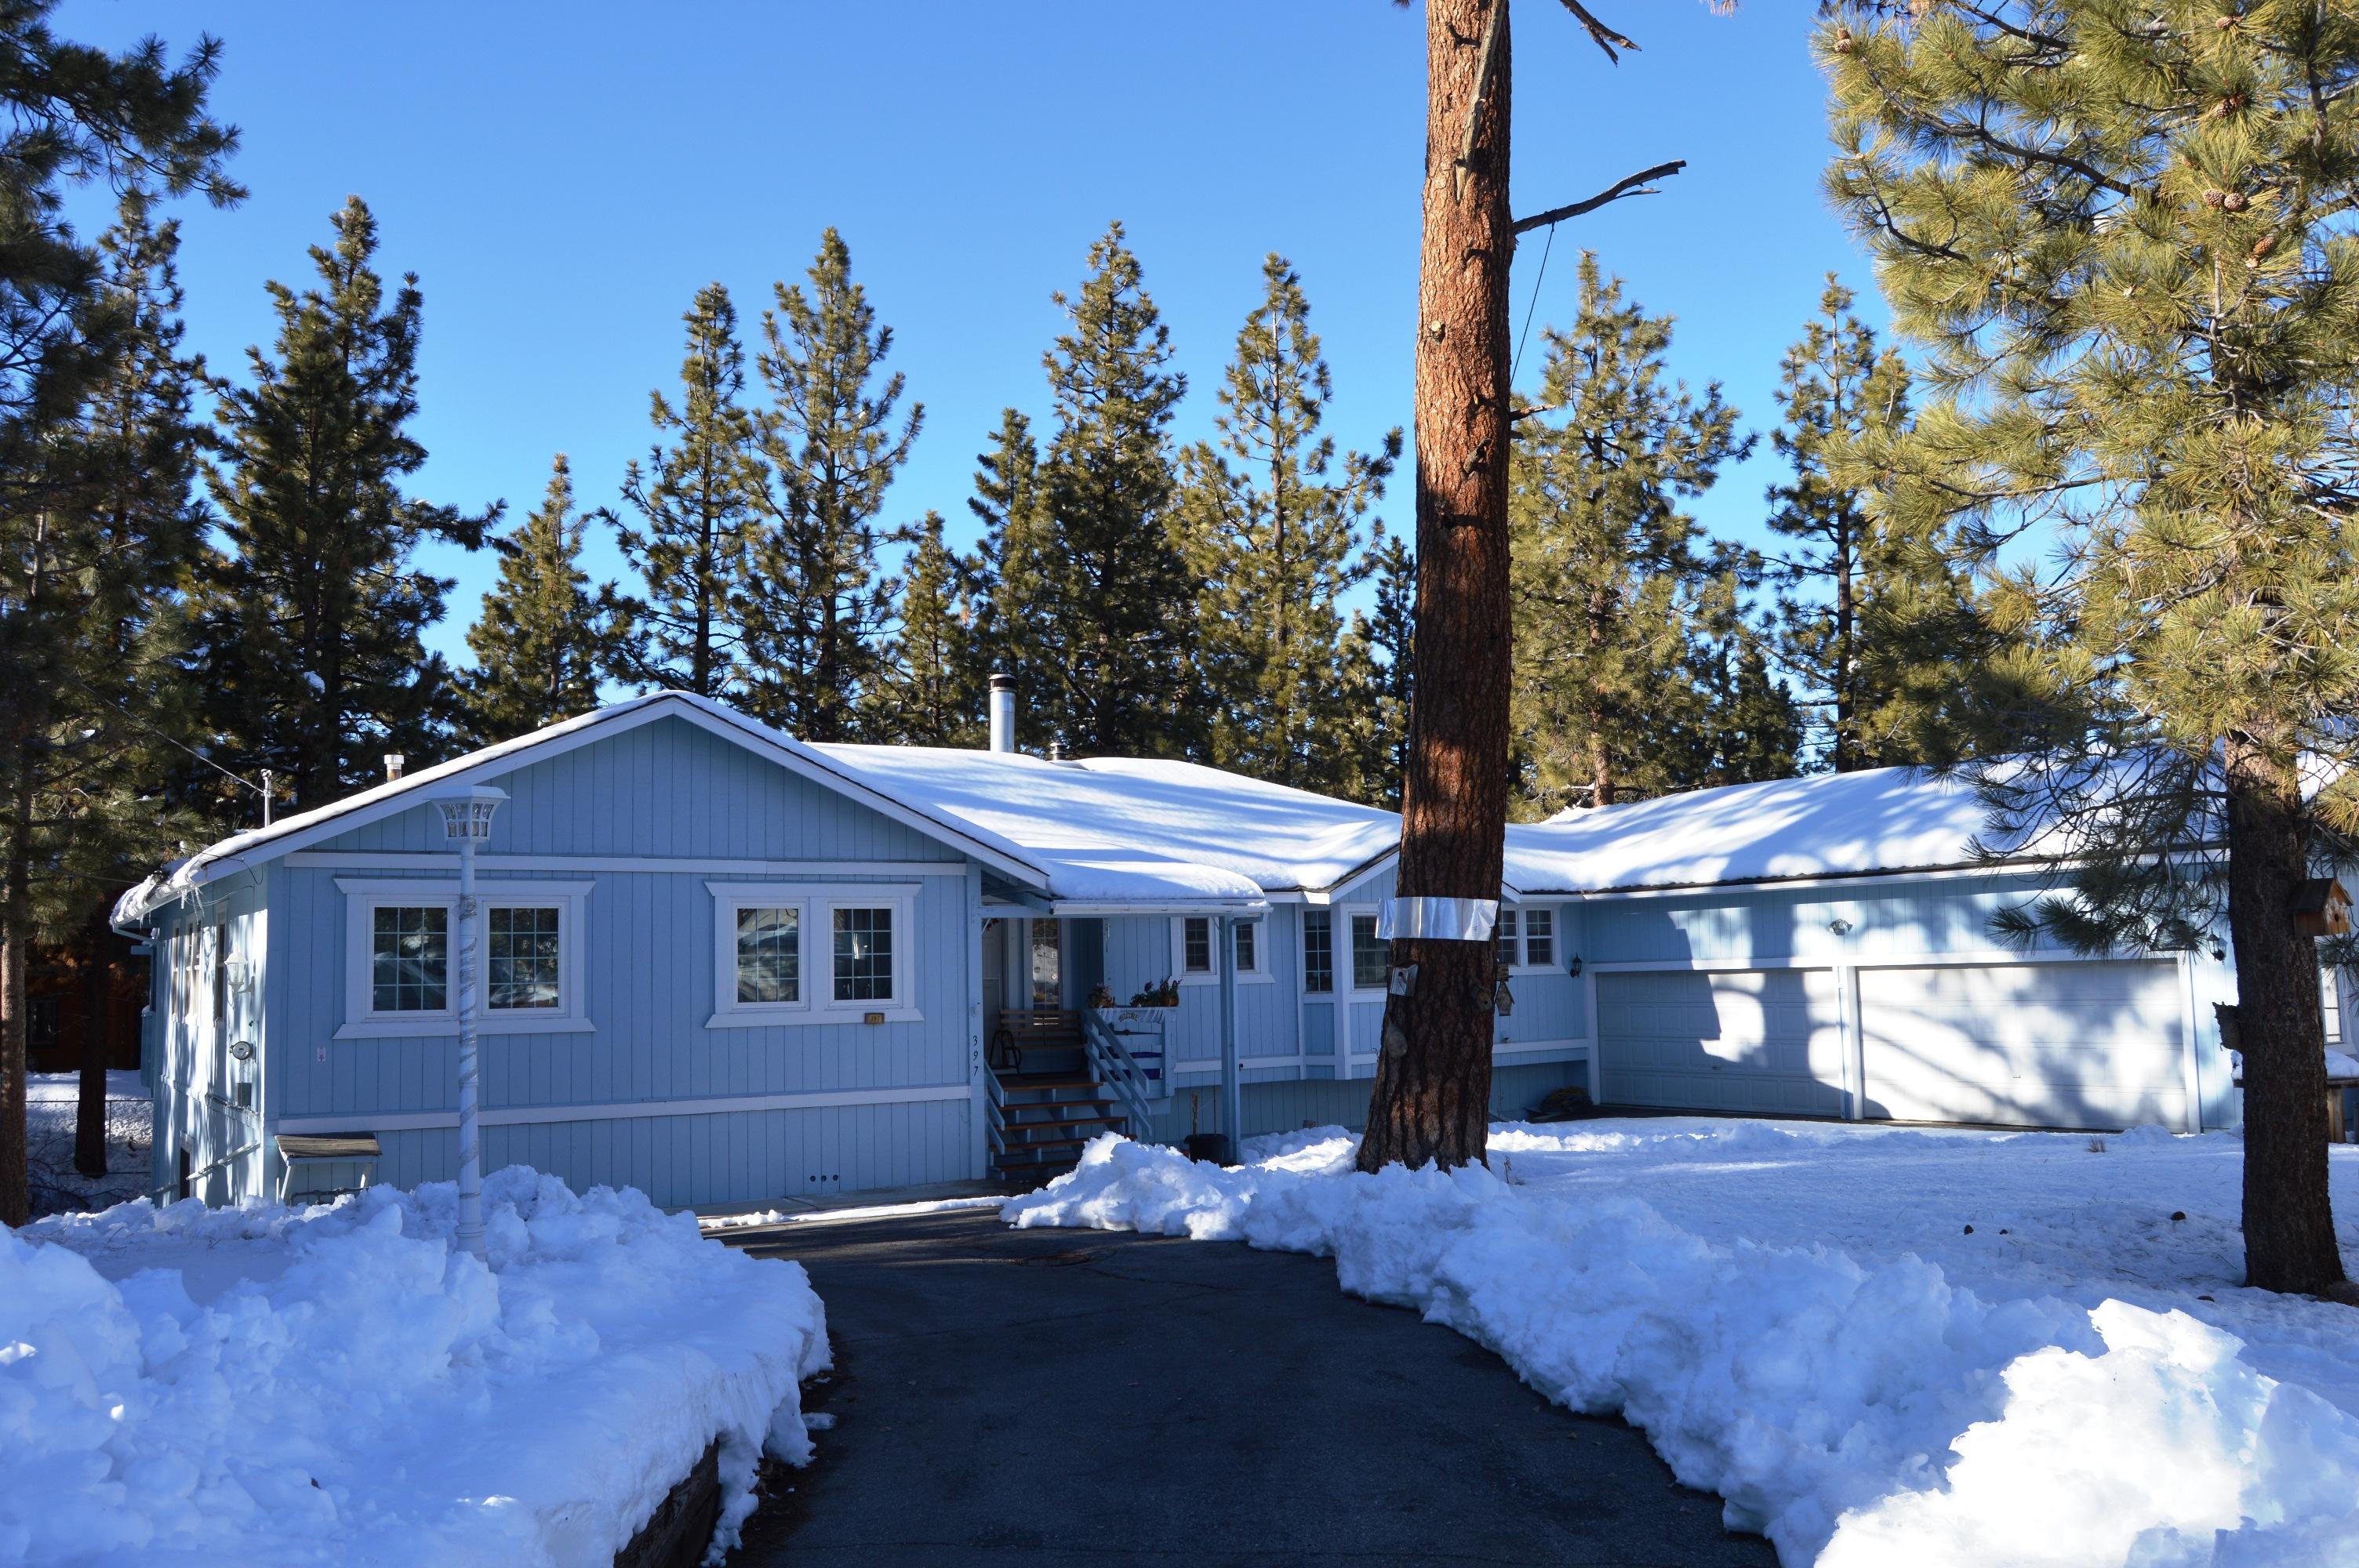 Single Family Home for Sale at 397 San Martin Big Bear City, California 92314 United States